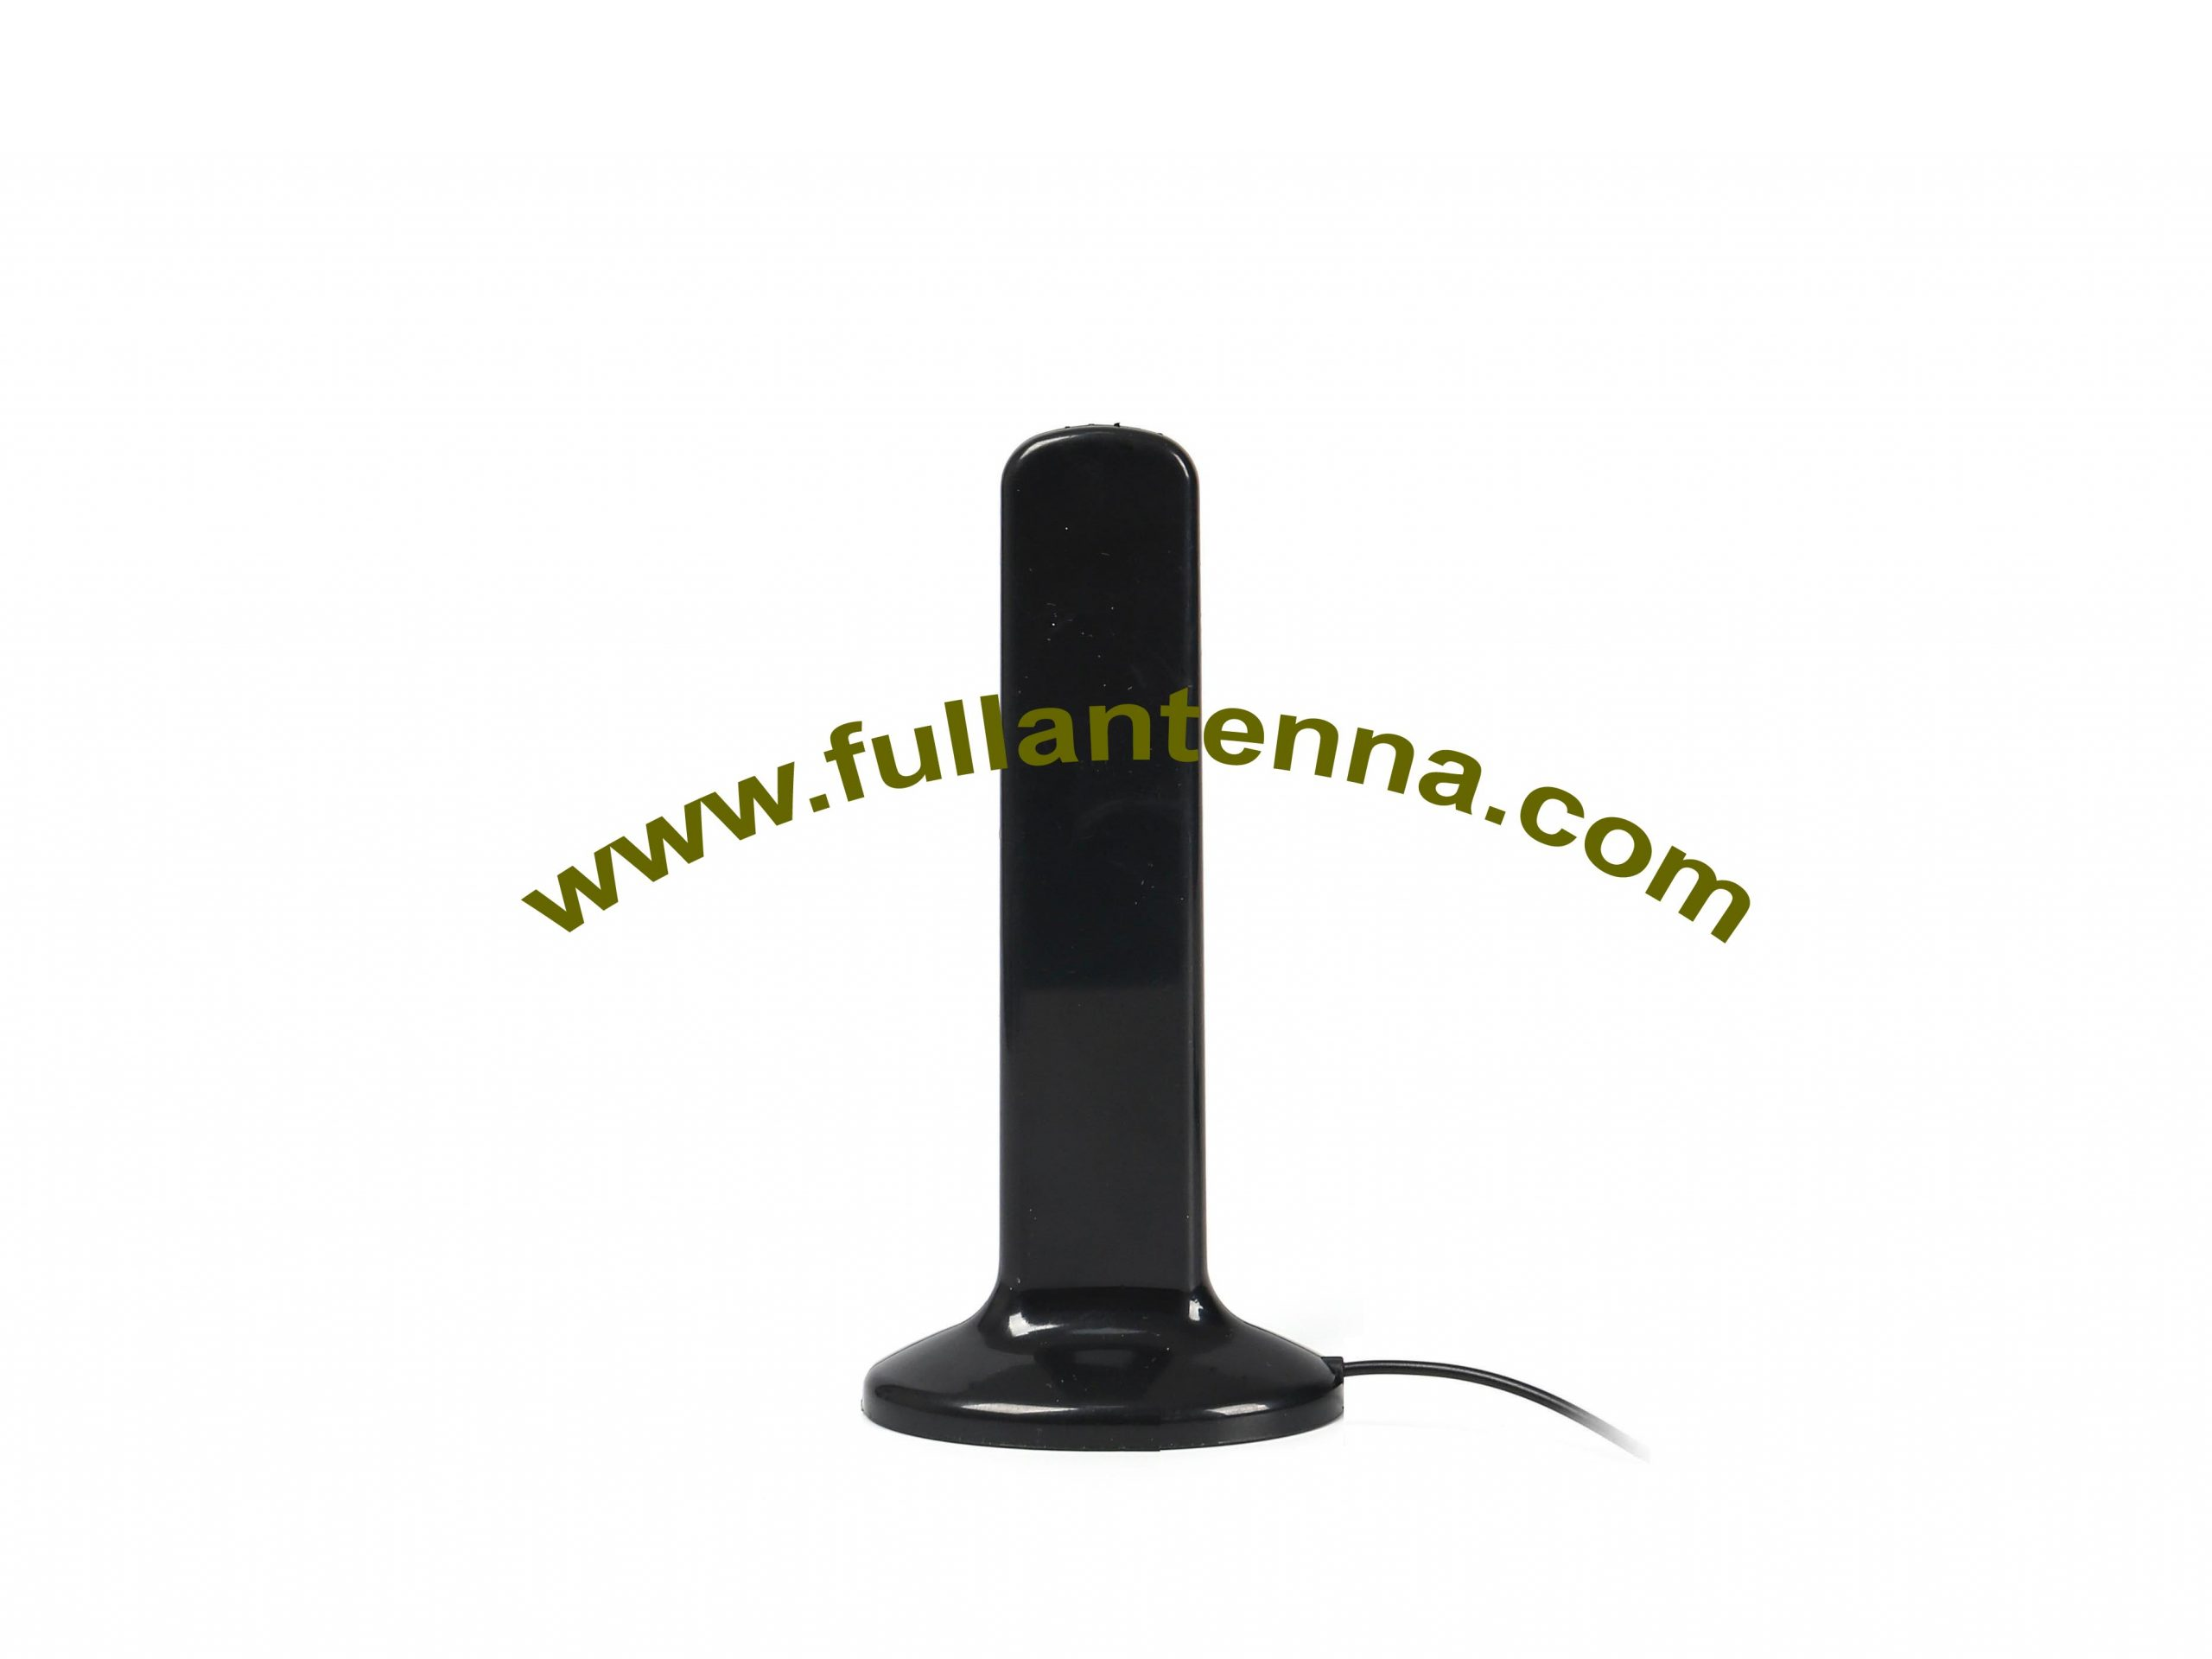 P/N:FALTE.Blade12,4G/LTE External Antenna,Blade 4G desk  antenna magnetic mount and waterproof